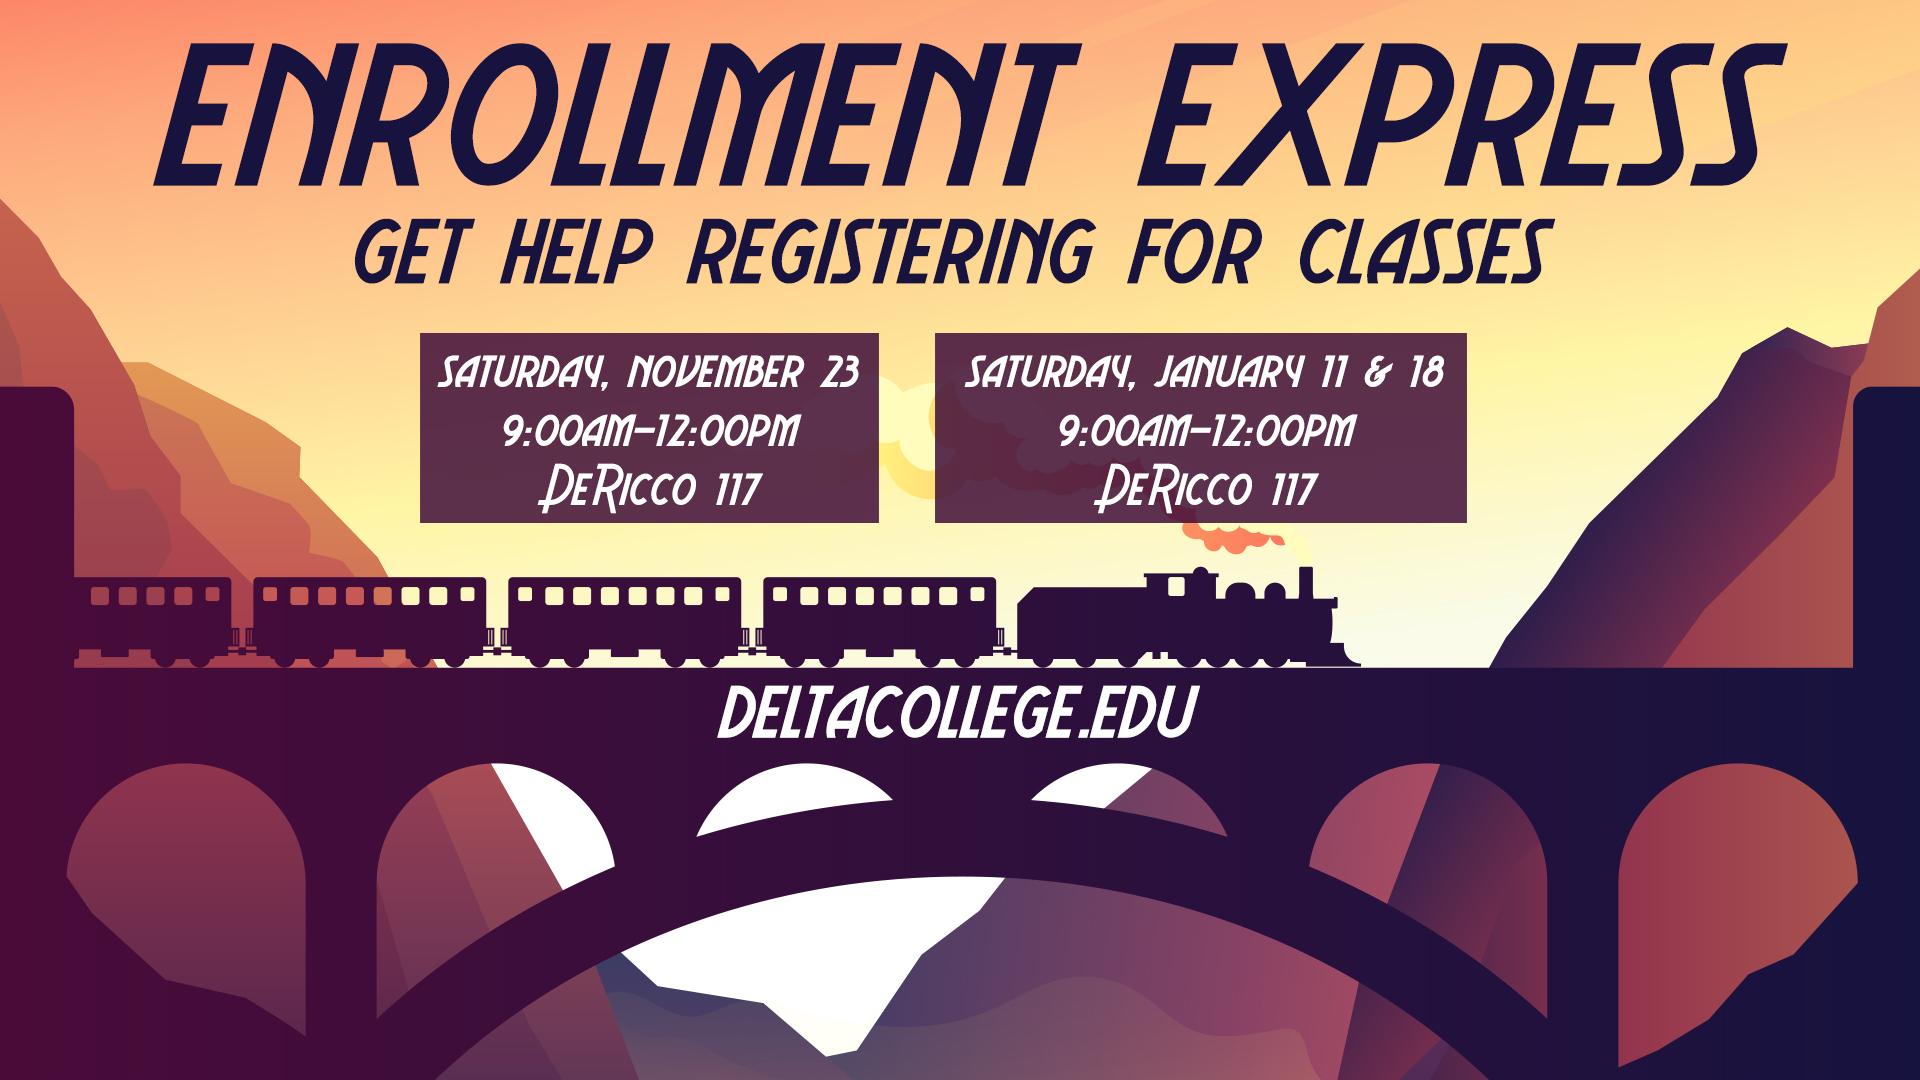 Enrollment Express. Get help registering for classes.